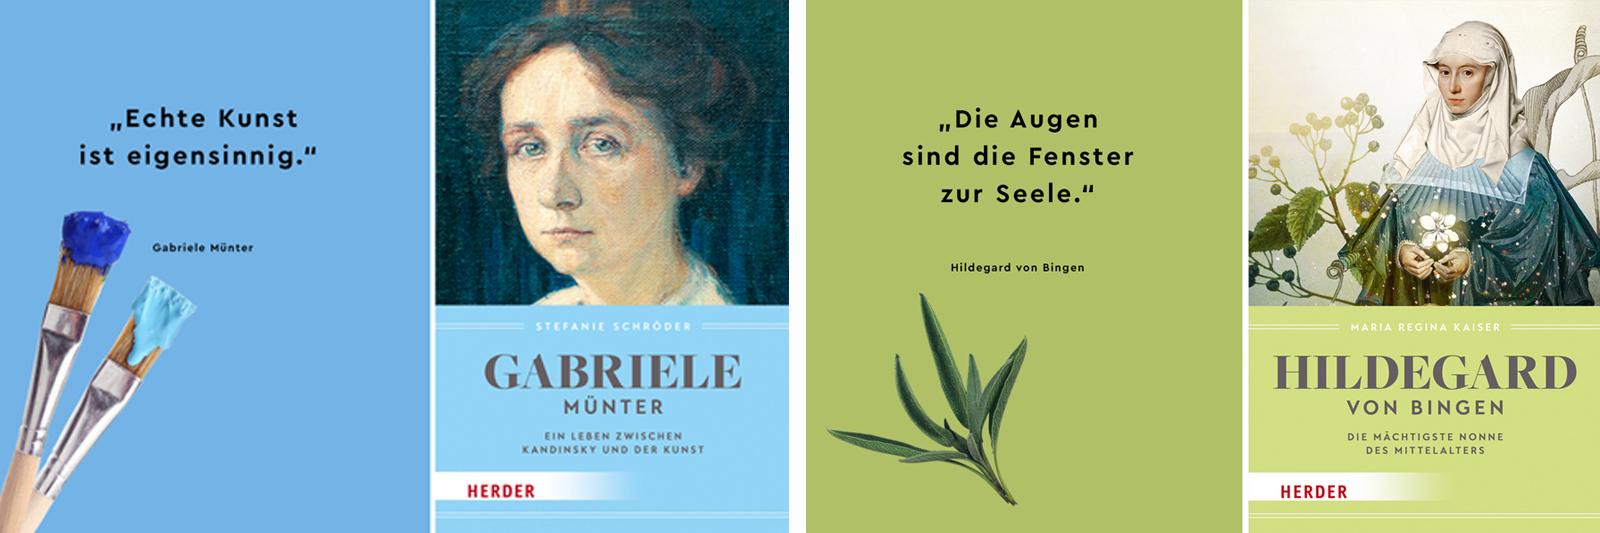 Gabriele & Hildegard